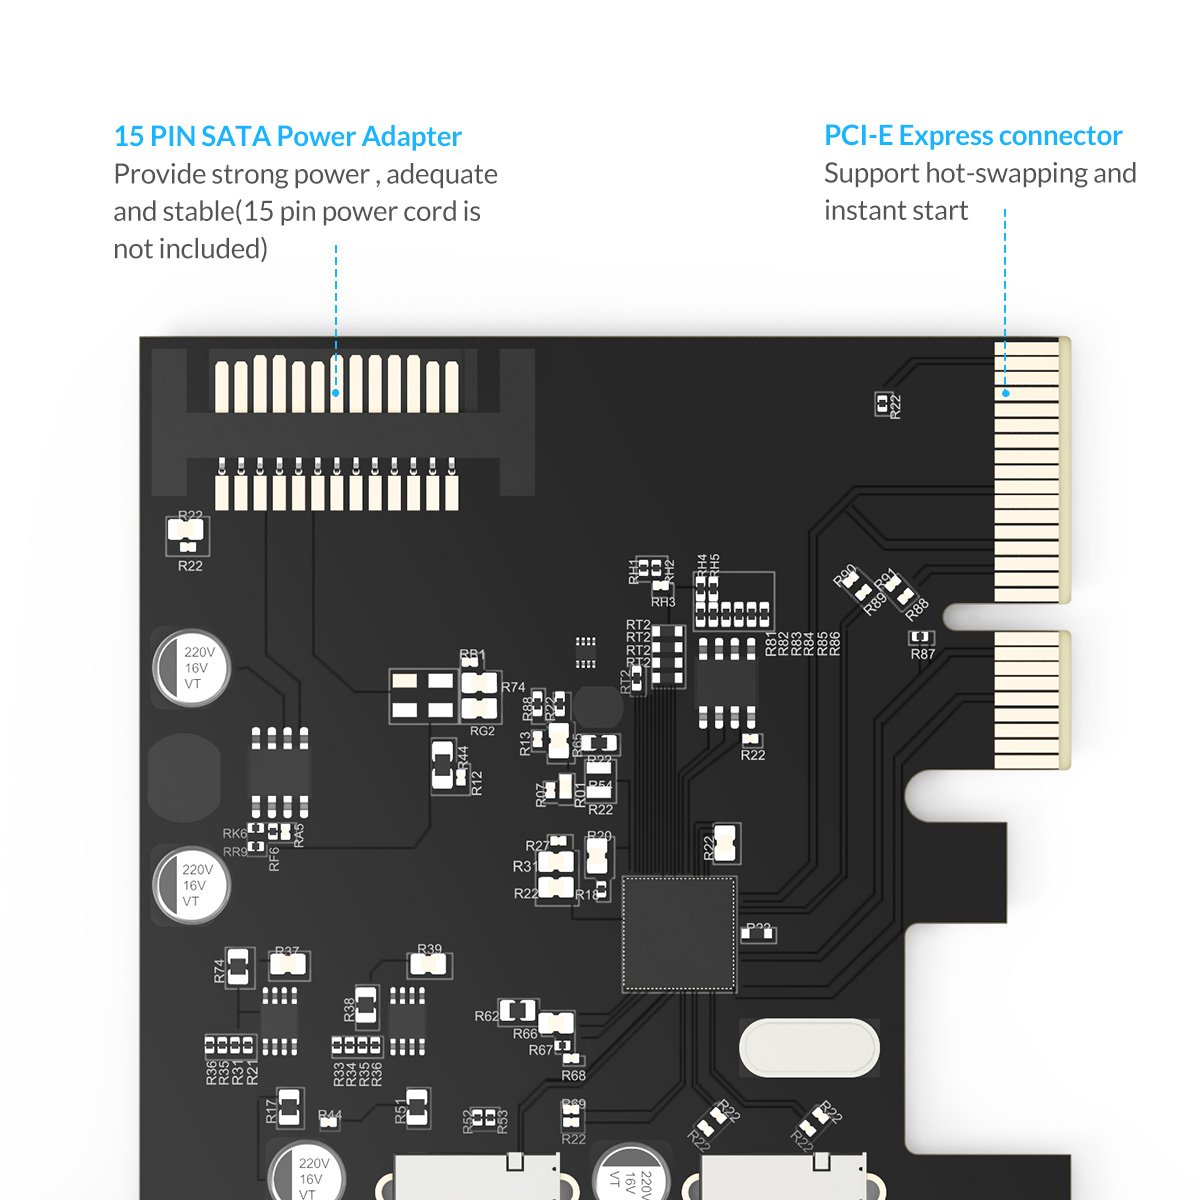 Amazon.com: ORICO USB3.1 PCI-E Expansion Card Adapter with 2 ...